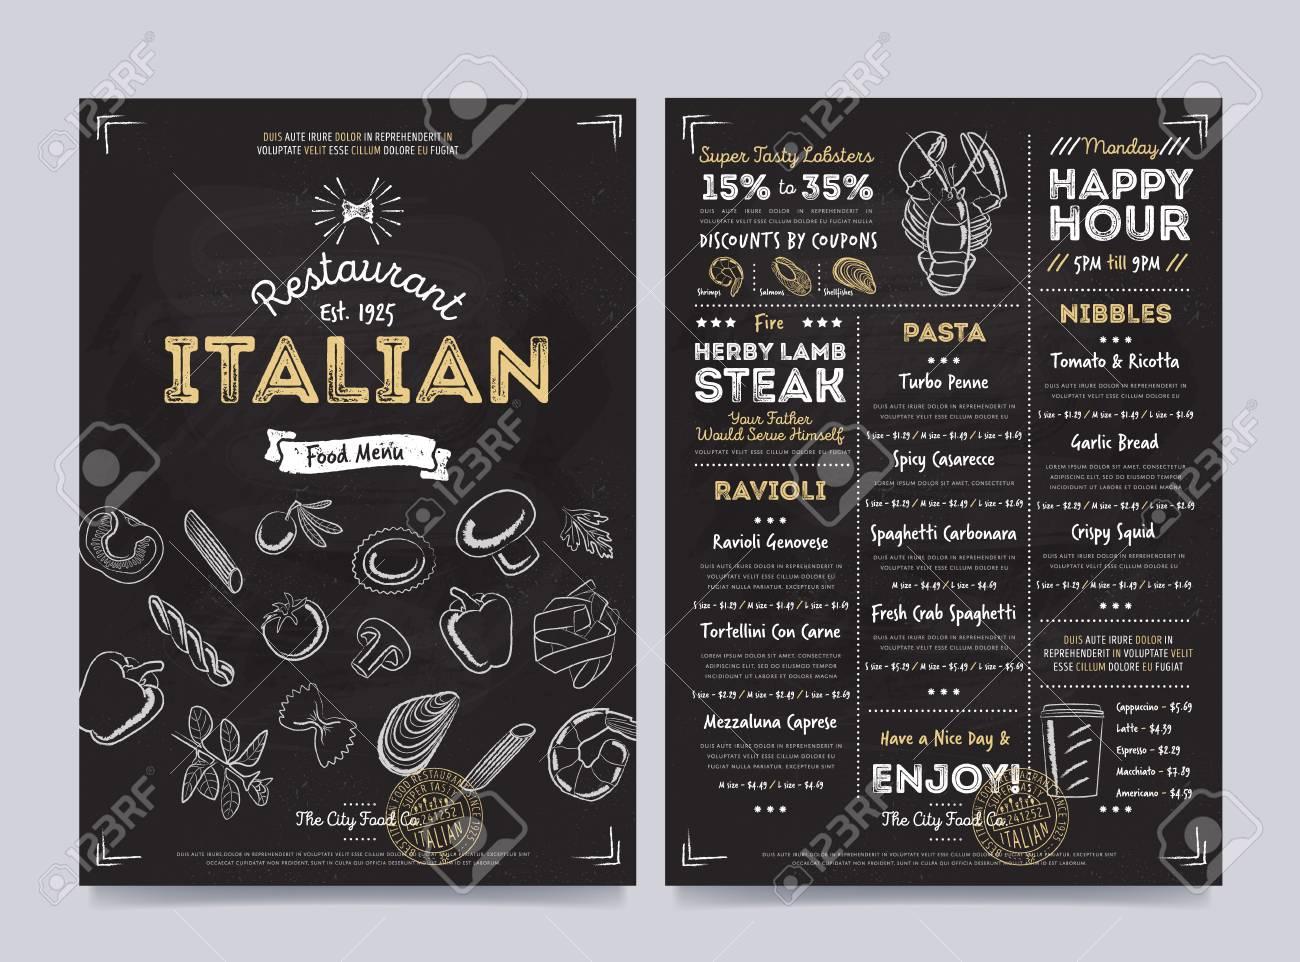 italian restaurant cafe menu template design on chalkboard